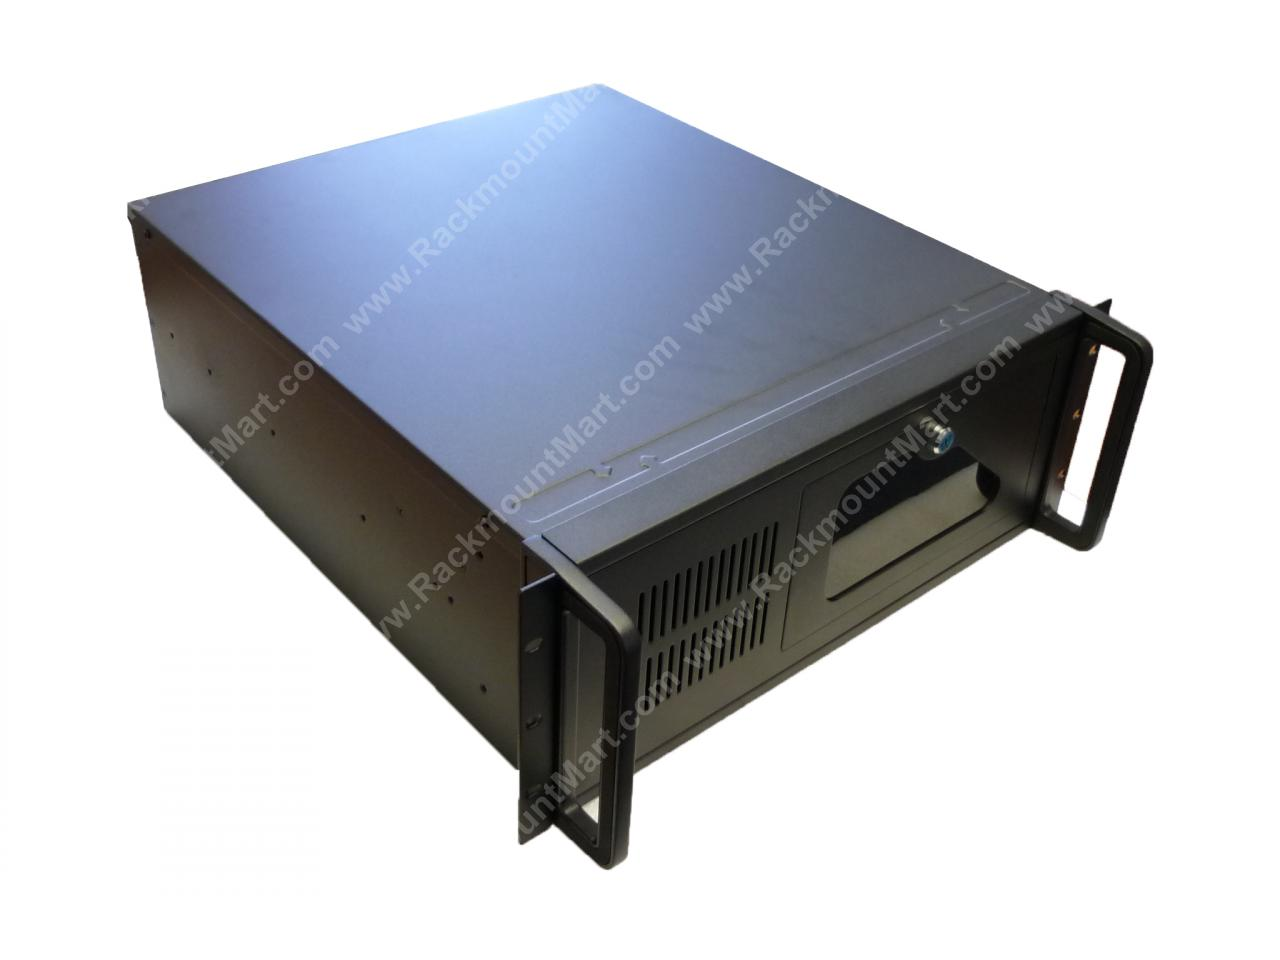 3u spi-400w(fan-lcd)(3x525+7xhdds bay)rackmount chassis(d1496) matx case new